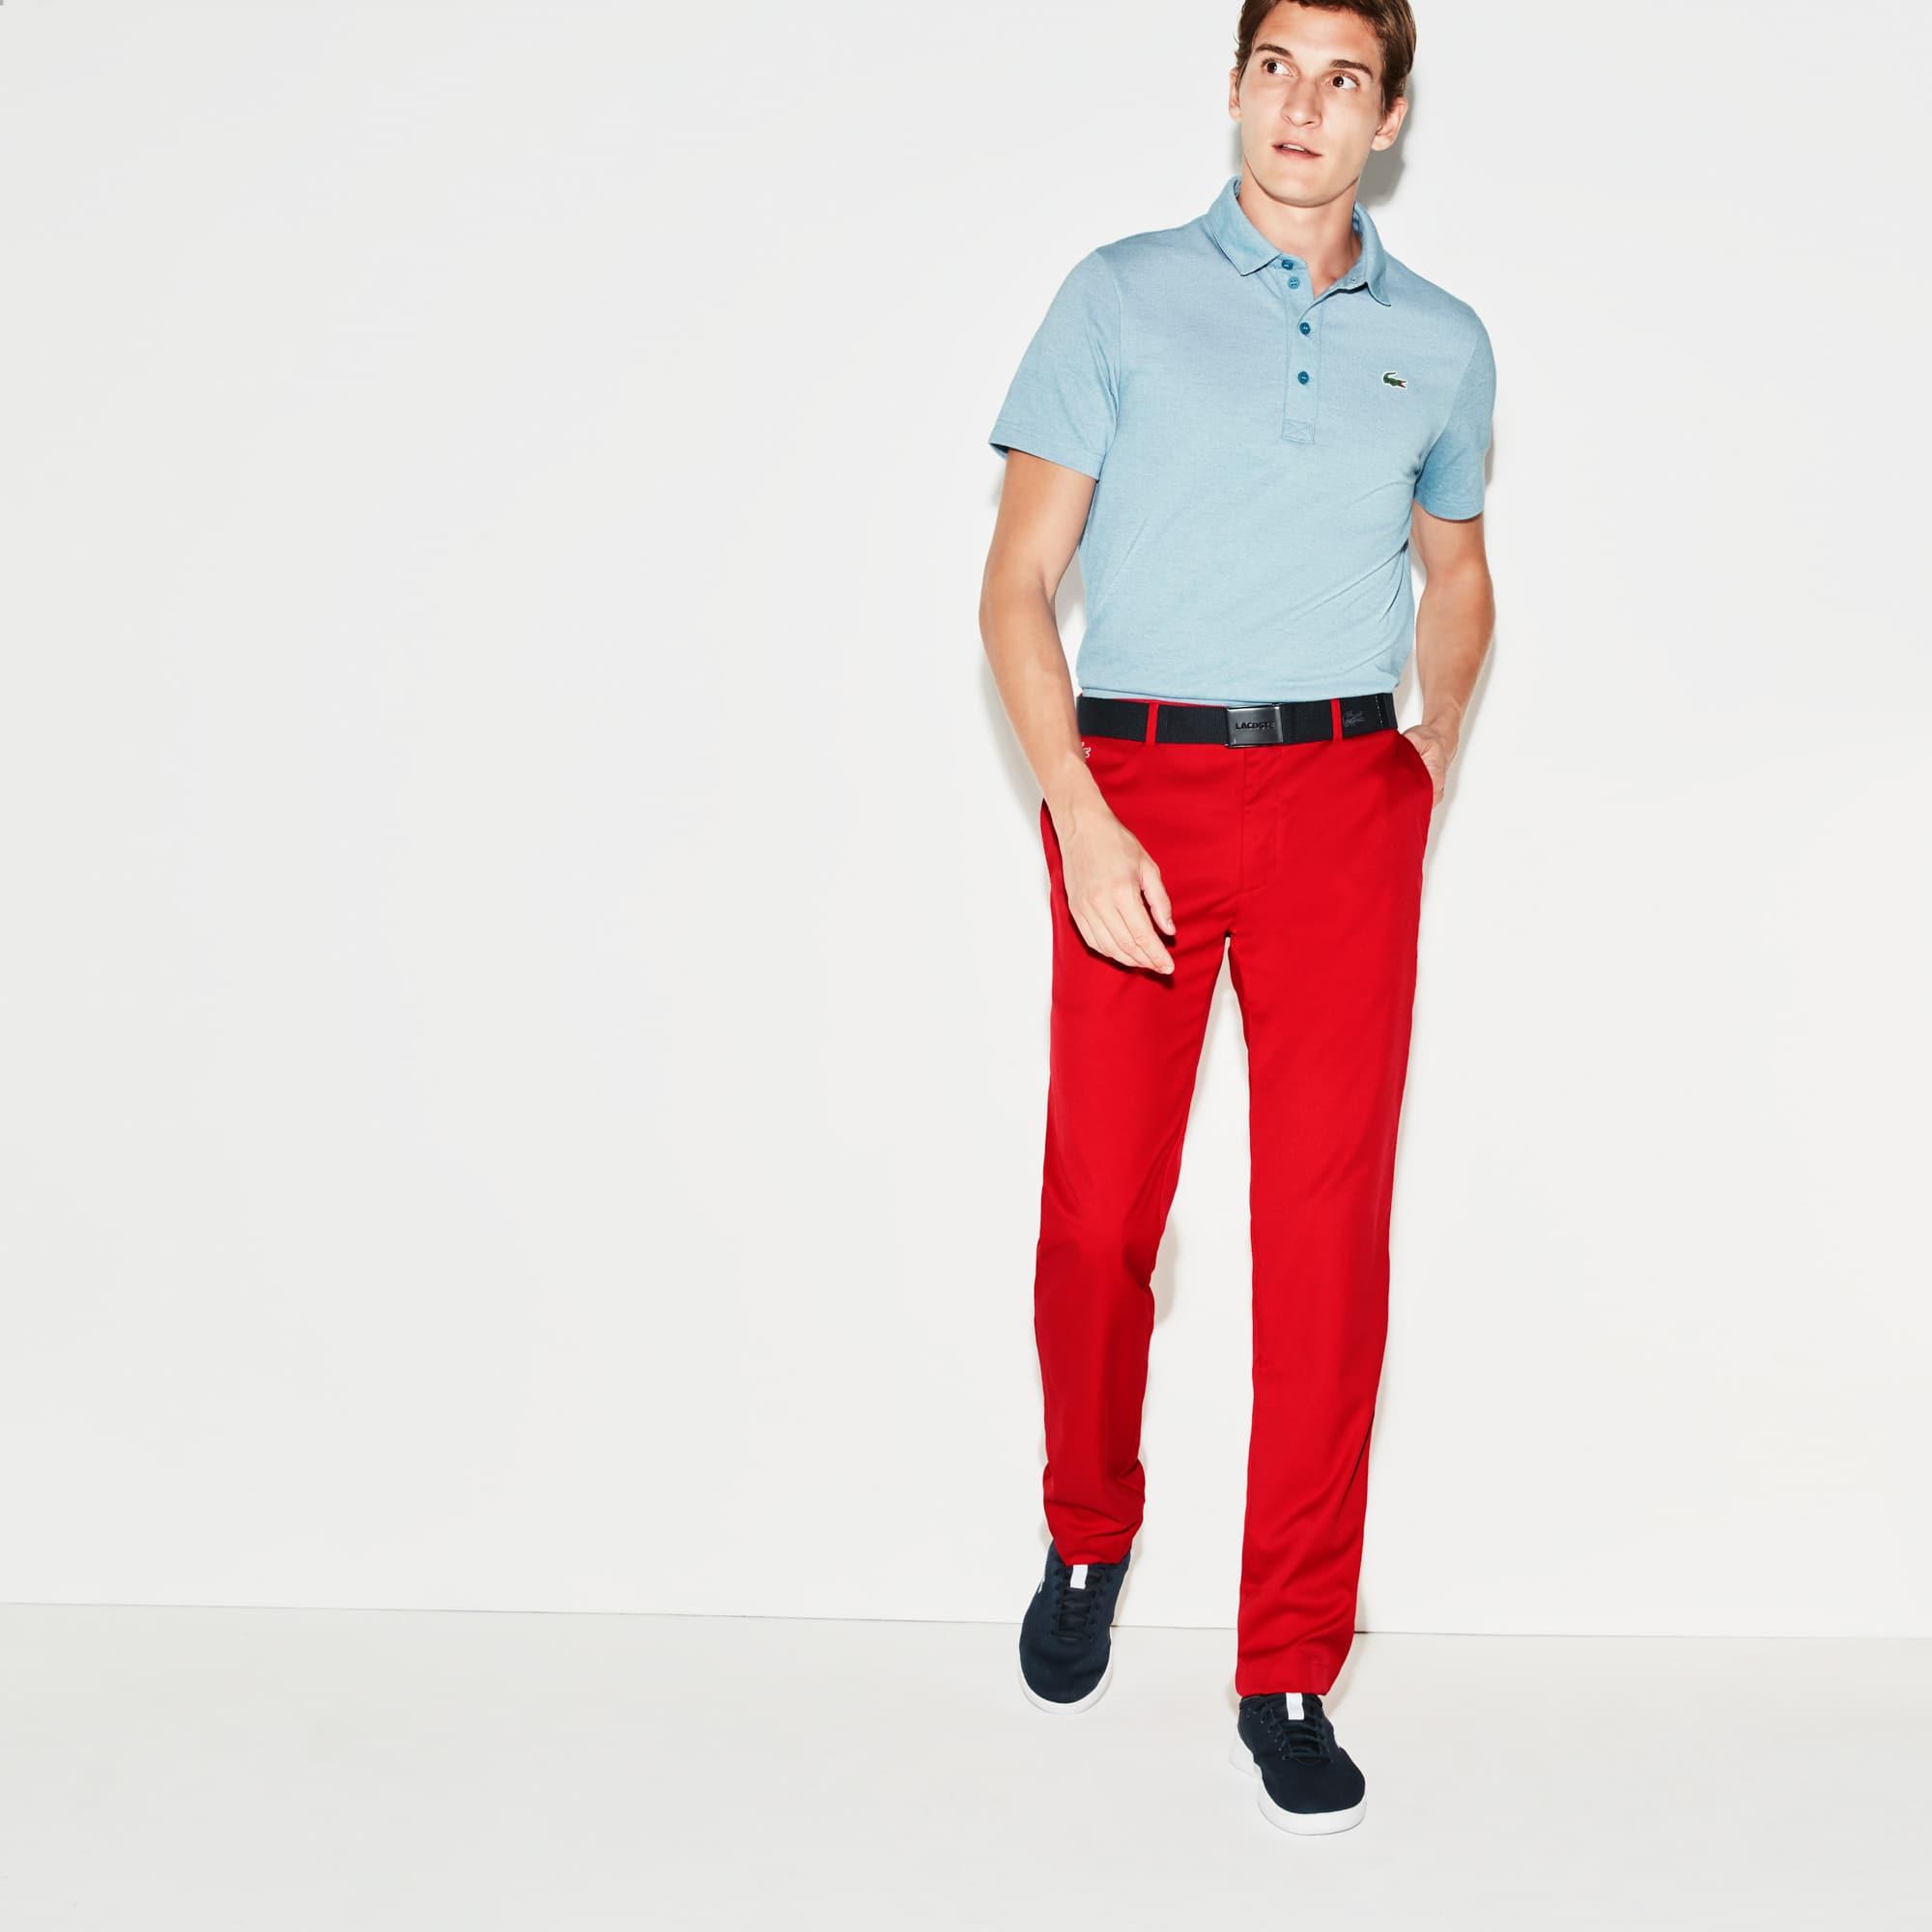 Men's Lacoste SPORT Golf chino pants in ultra-dry technical gabardine